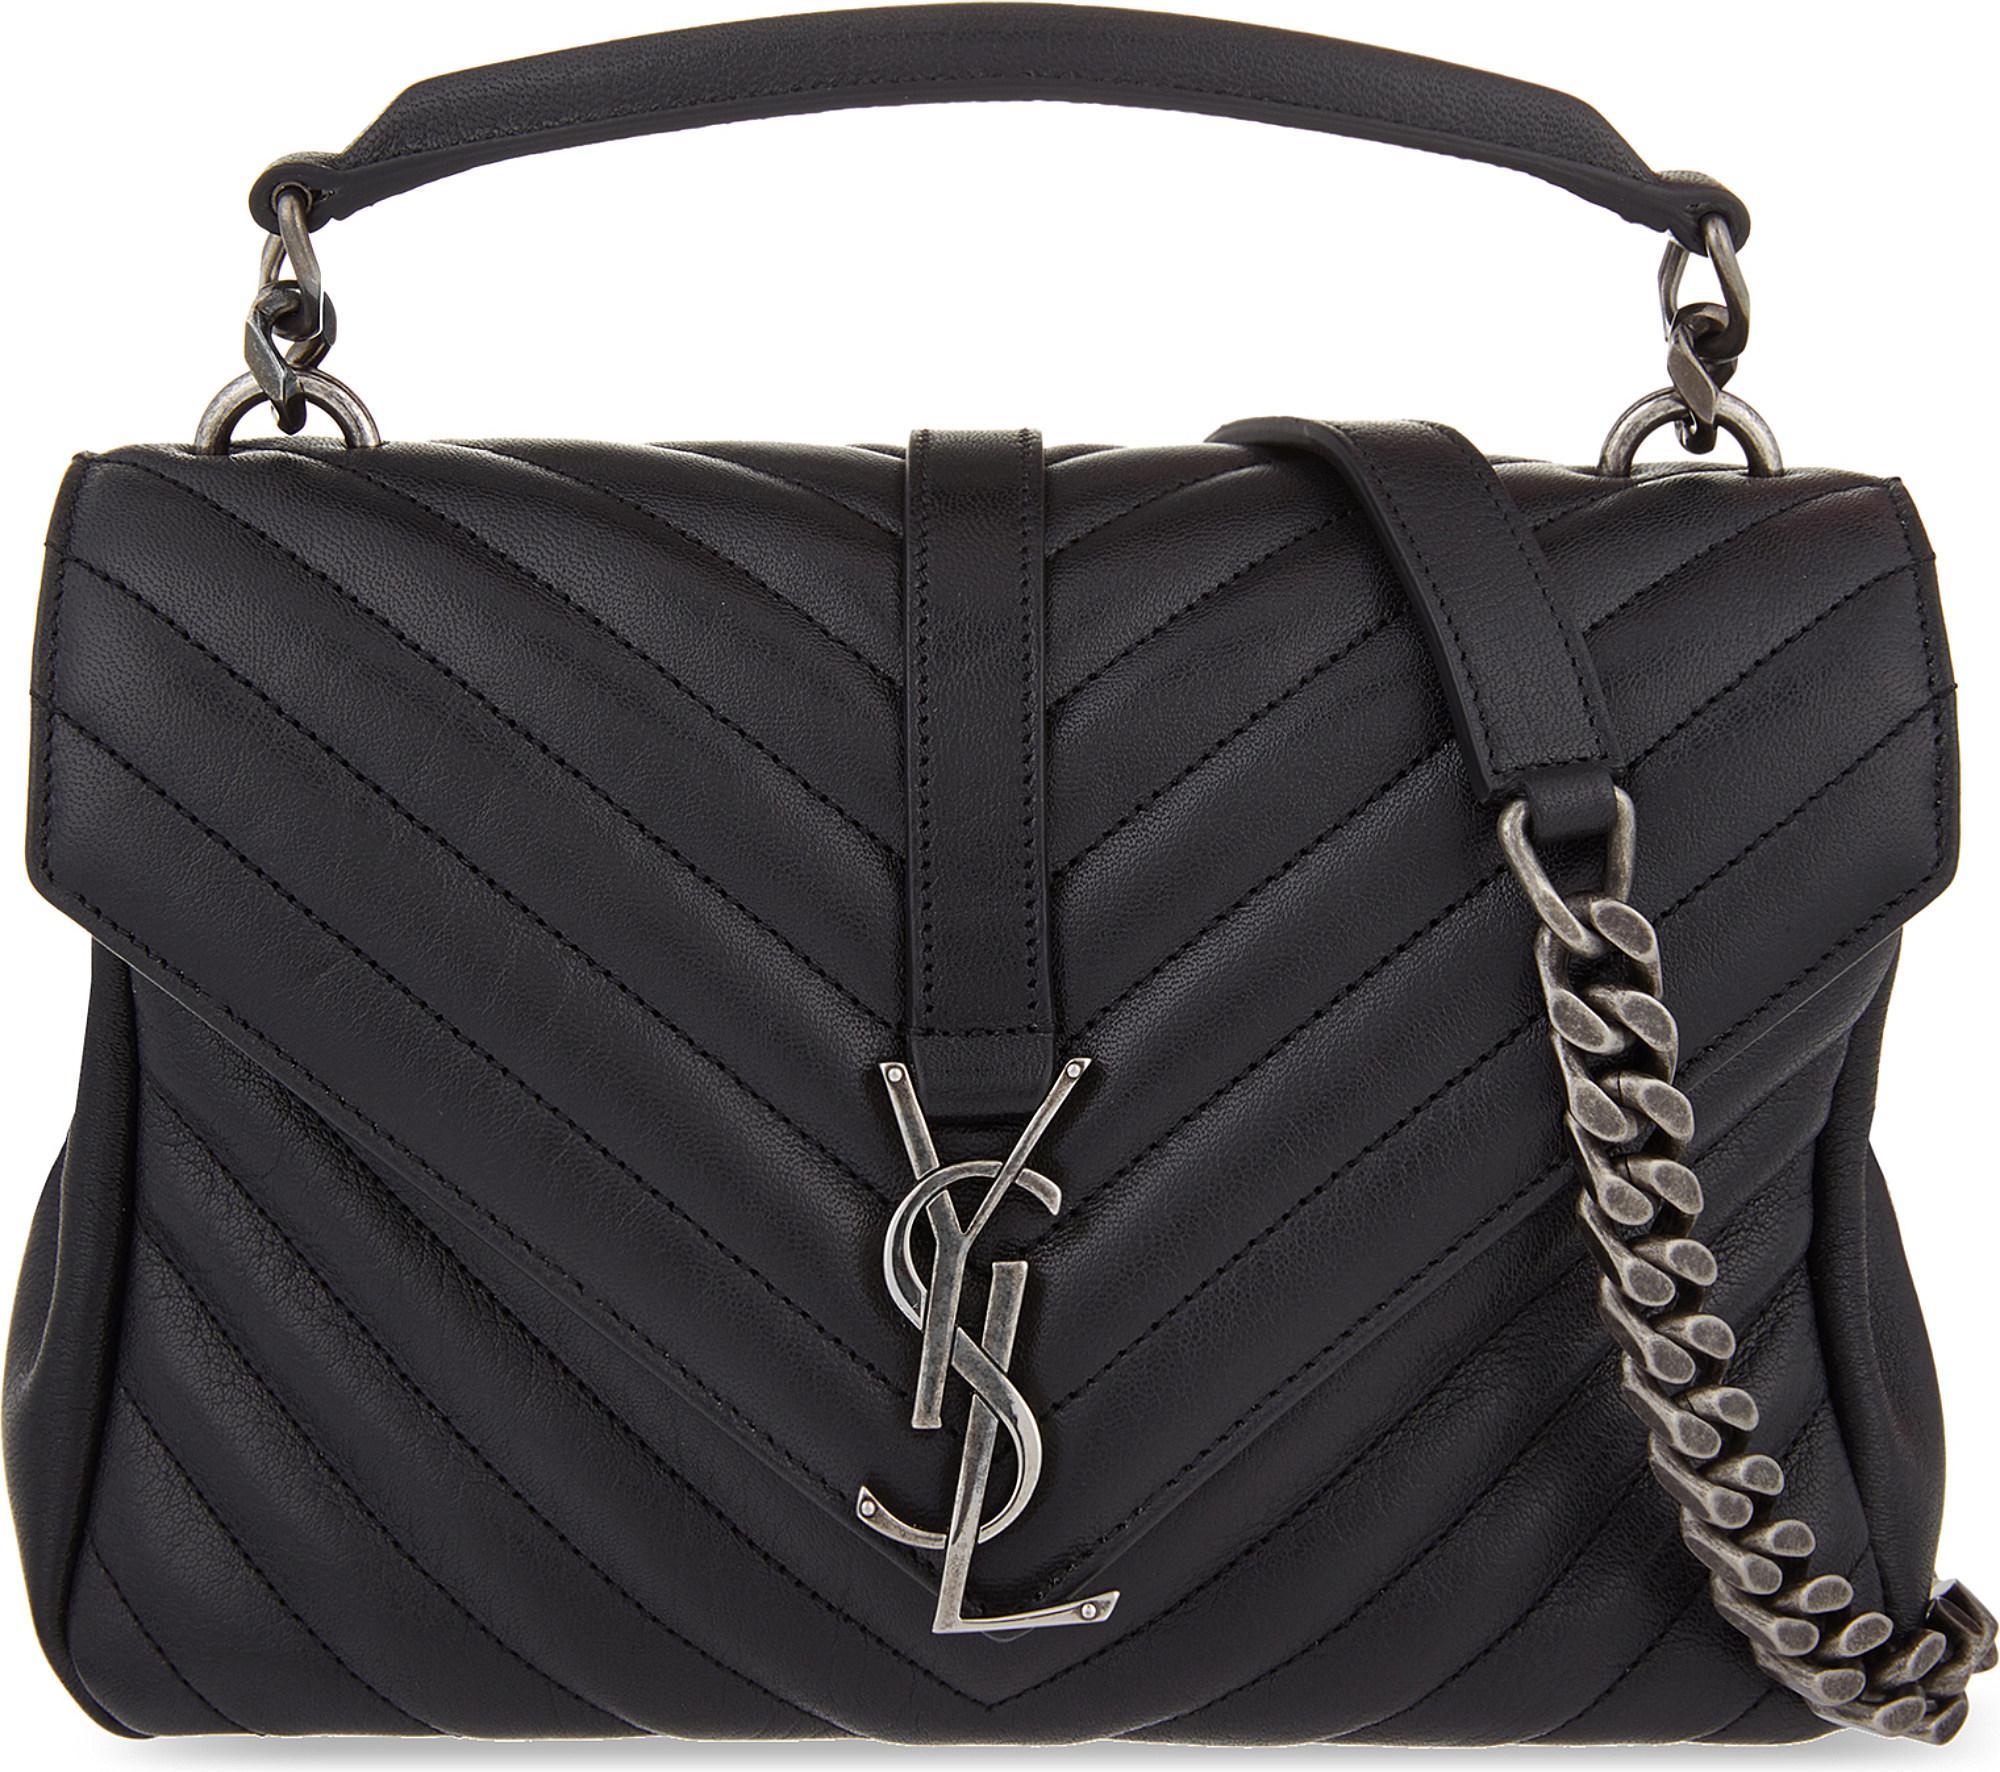 Saint Laurent. Women s Black Monogram College Small Quilted Leather Shoulder  Bag 4121920b8144a